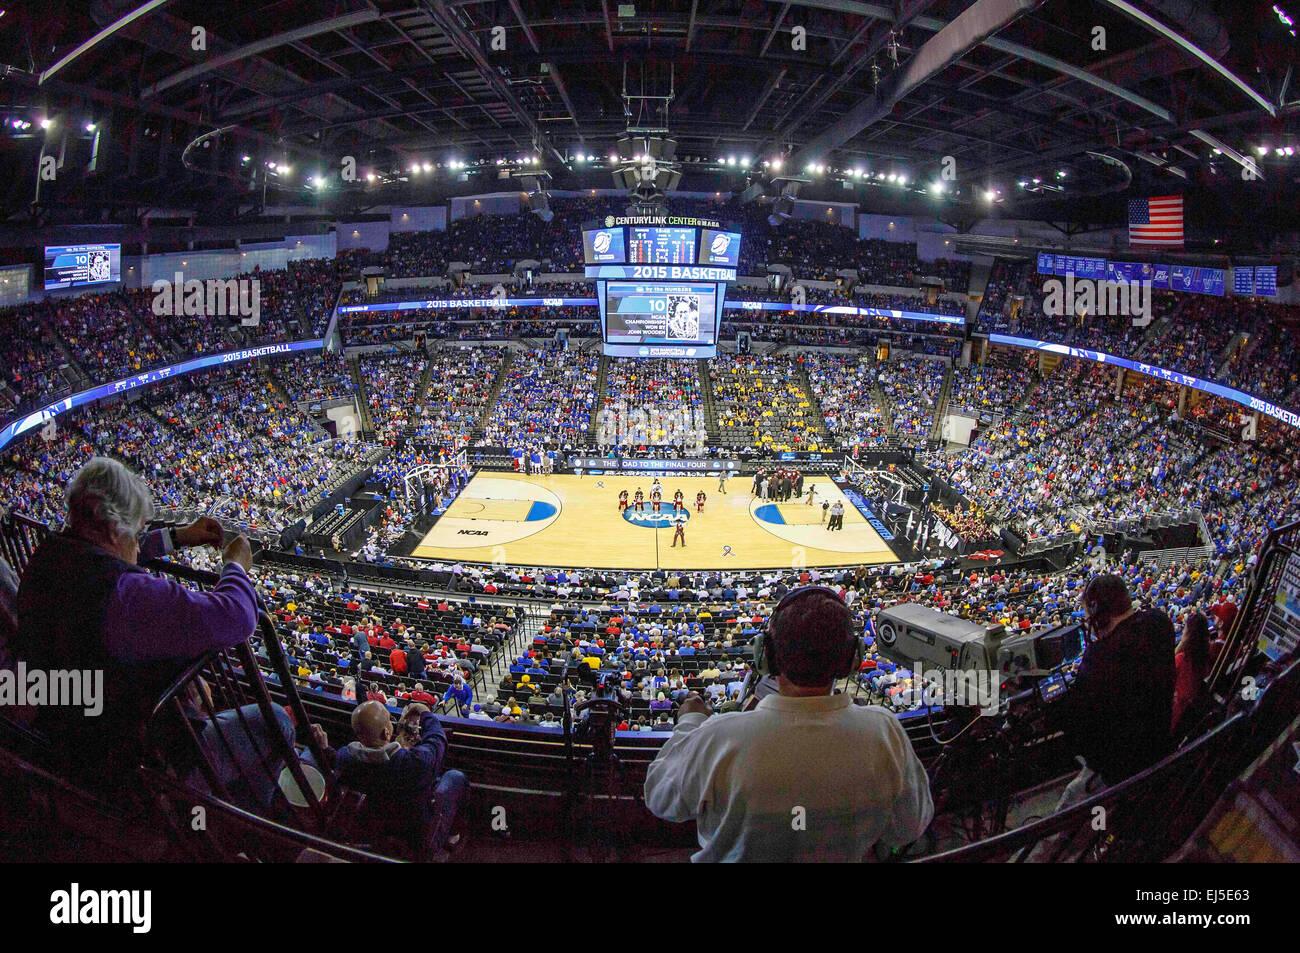 Centurylink Center Omaha >> Omaha Ne Usa 20th Mar 2015 Centurylink Center Arena During The